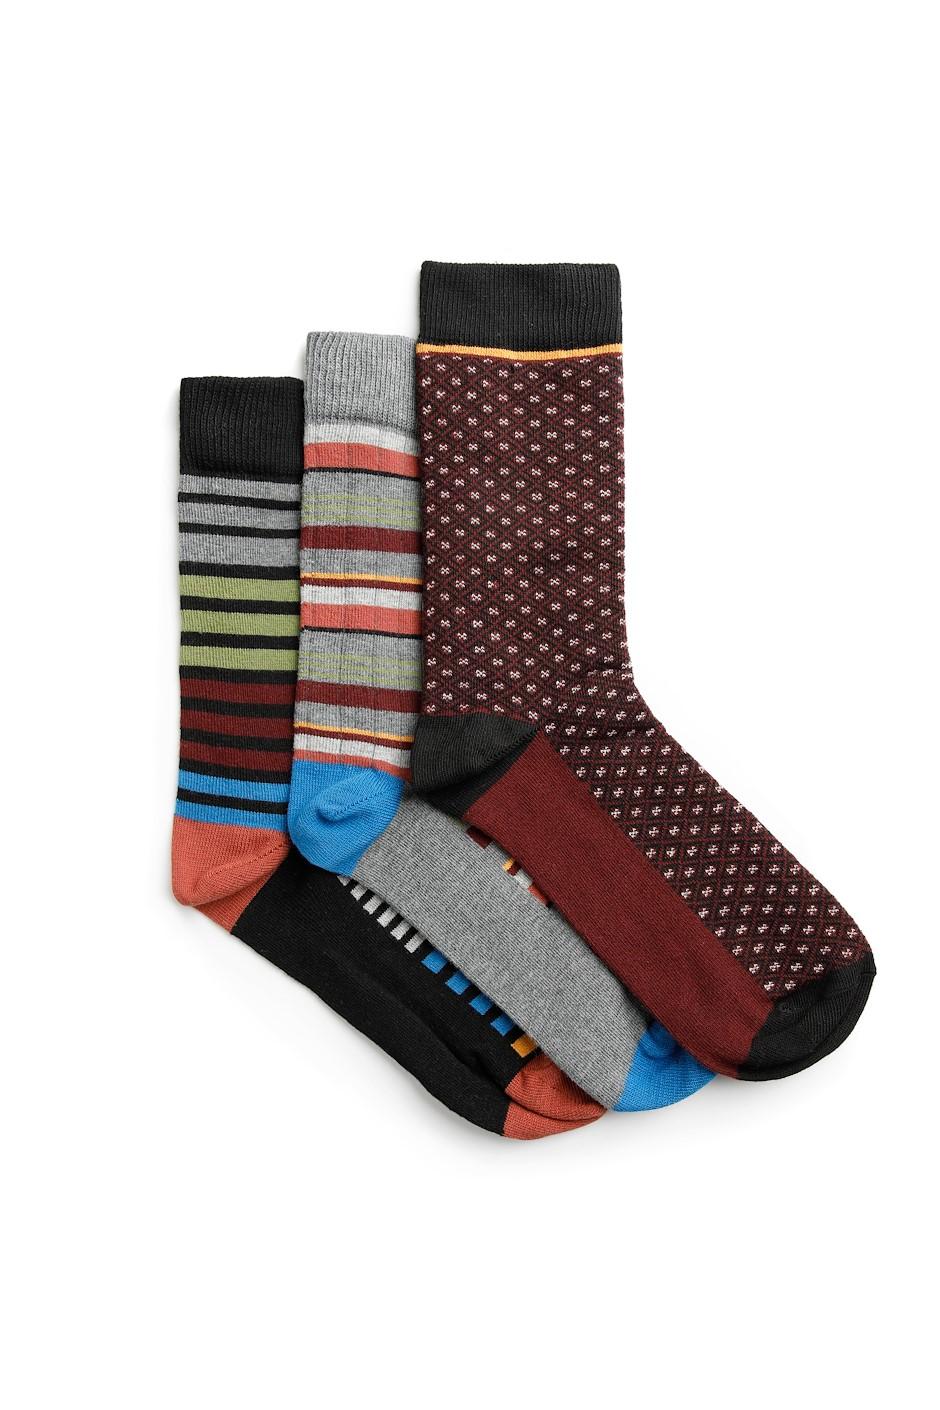 Wyatt Eco Stripe Socks Multi-Pack Coal